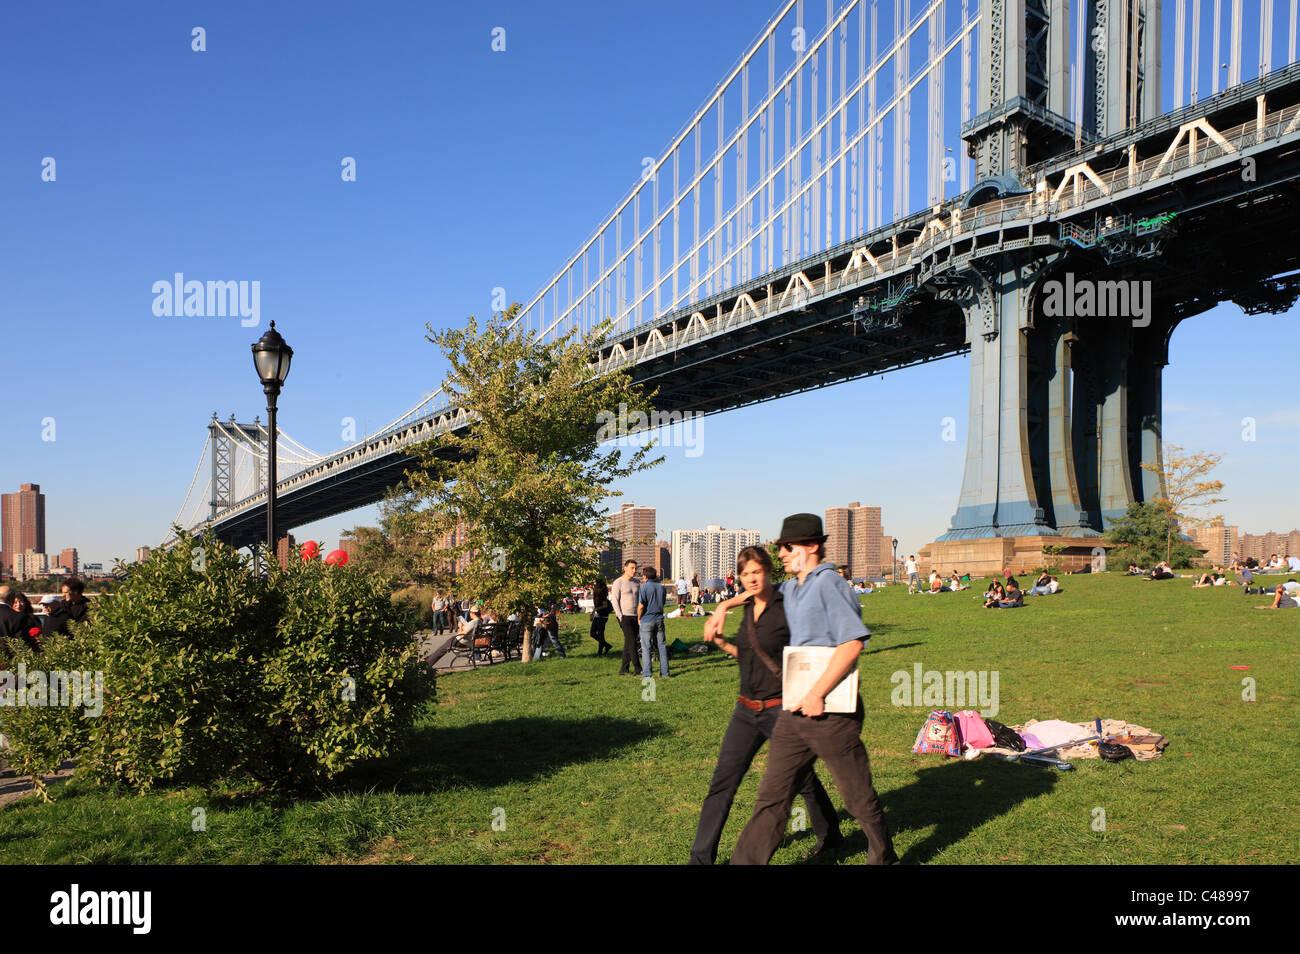 People on the grass under the Manhattan Bridge, New York City, USA - Stock Photo